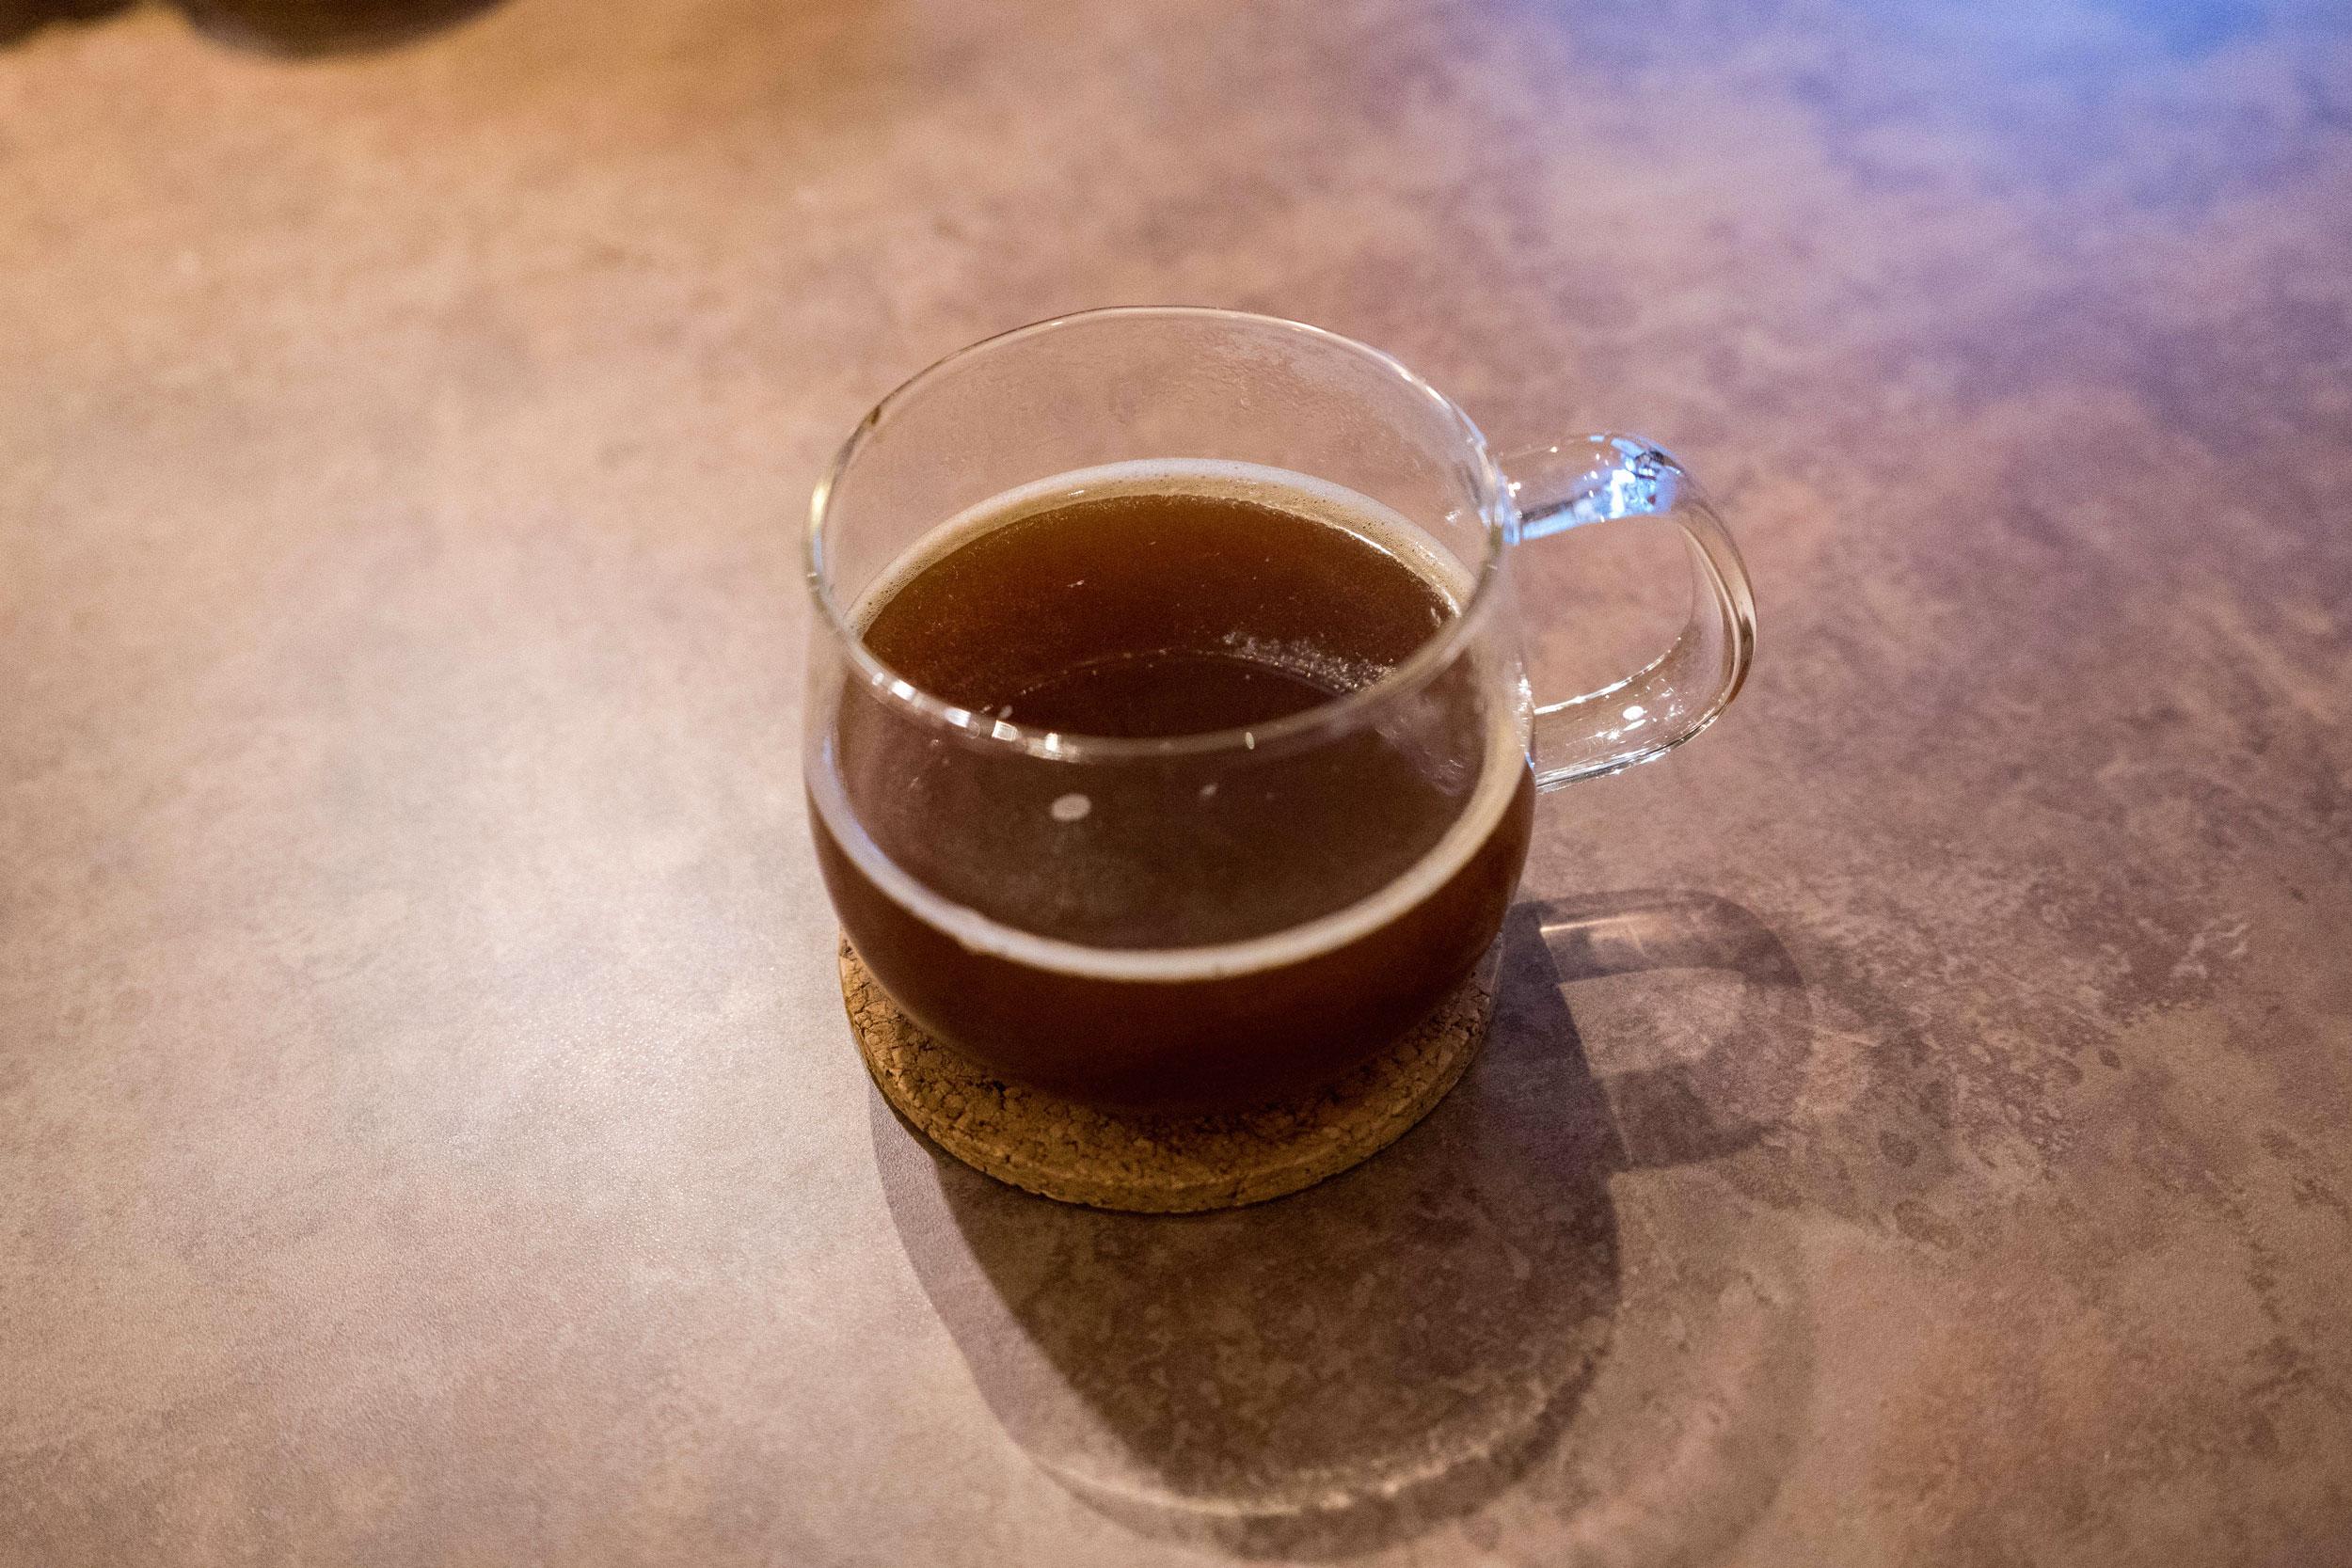 nagano-17-matsumoto-hop-frogs-cafe-01.jpg